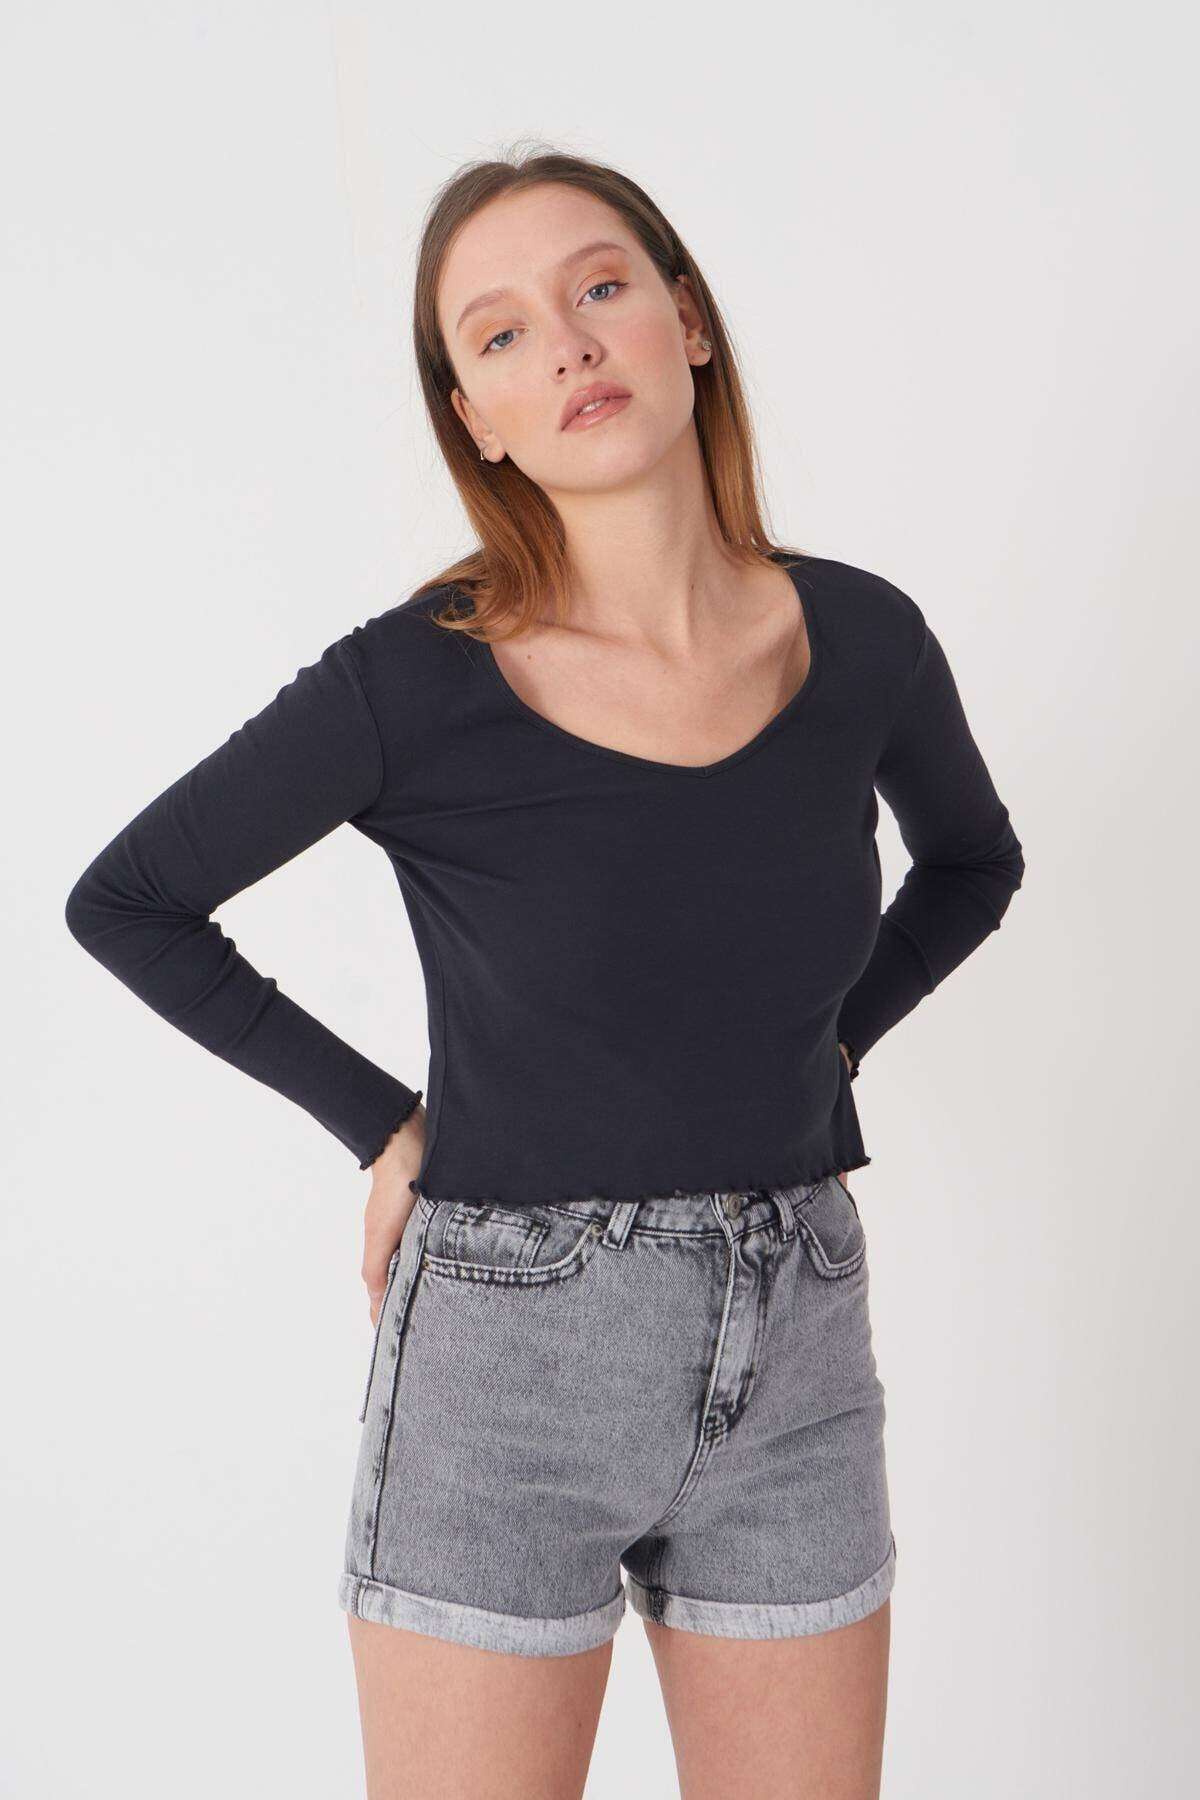 Addax Kadın Antrasit V Yaka Bluz P1085 - E11 Adx-0000023312 3